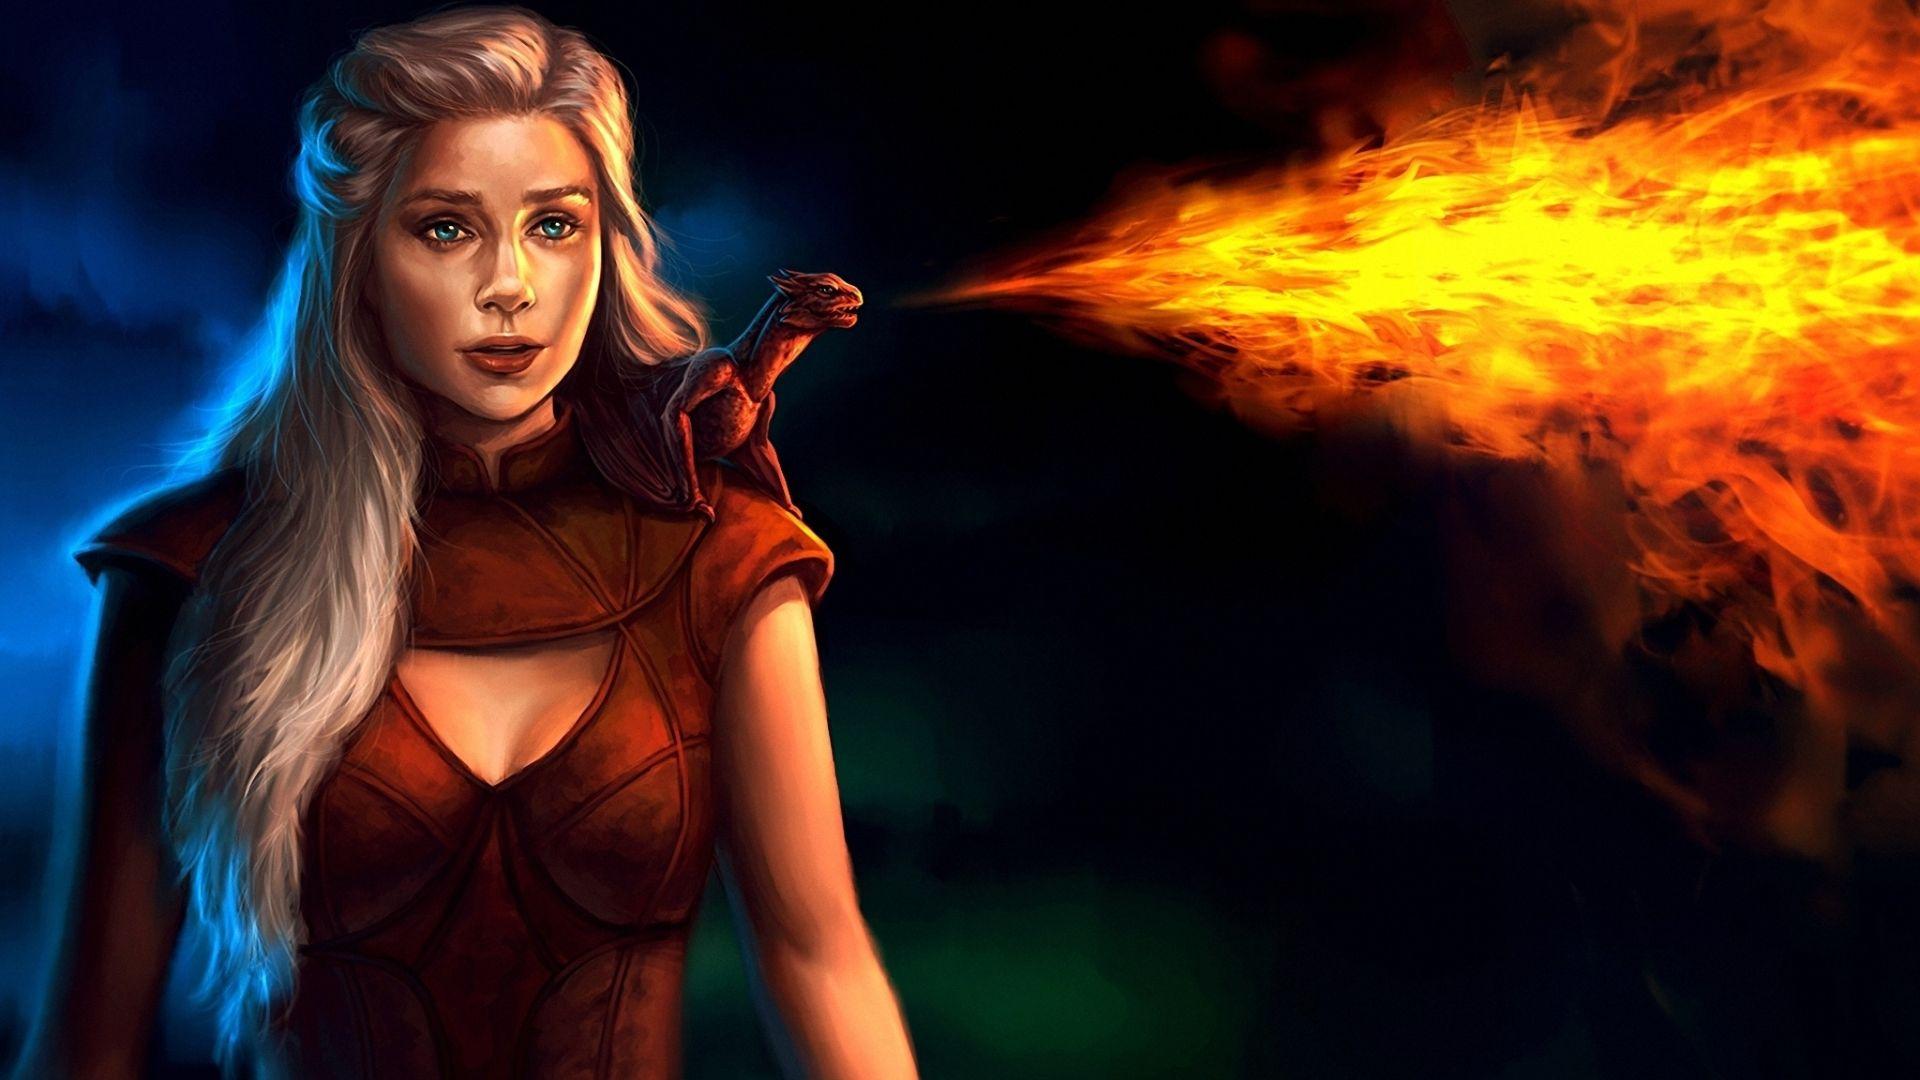 Game of Thrones Daenerys Targaryen fan art